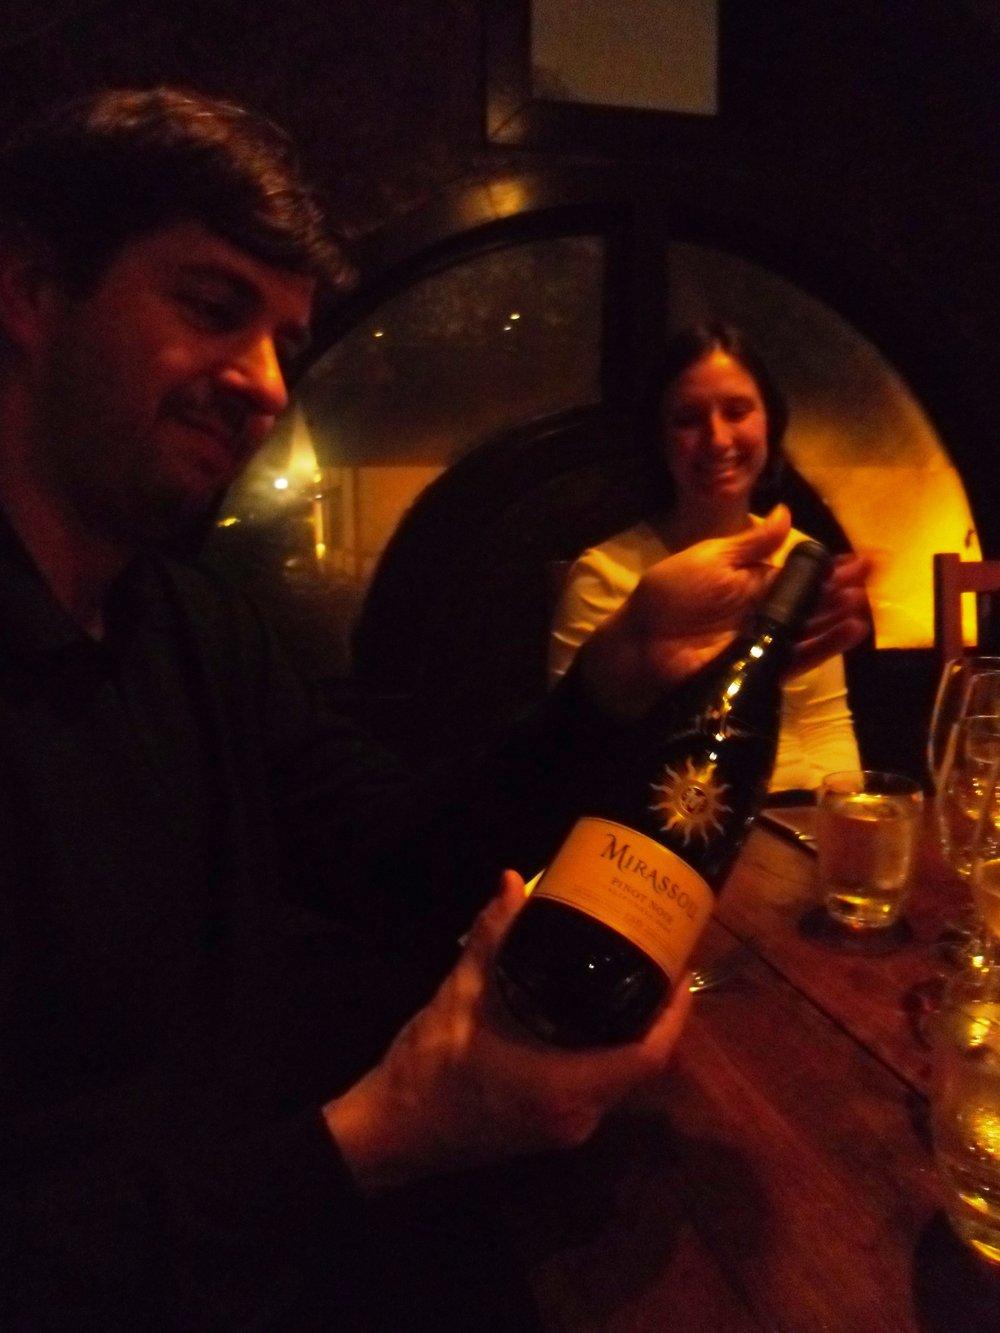 mirassou-wine-dinner-atlanta-wine-tasting5.jpg